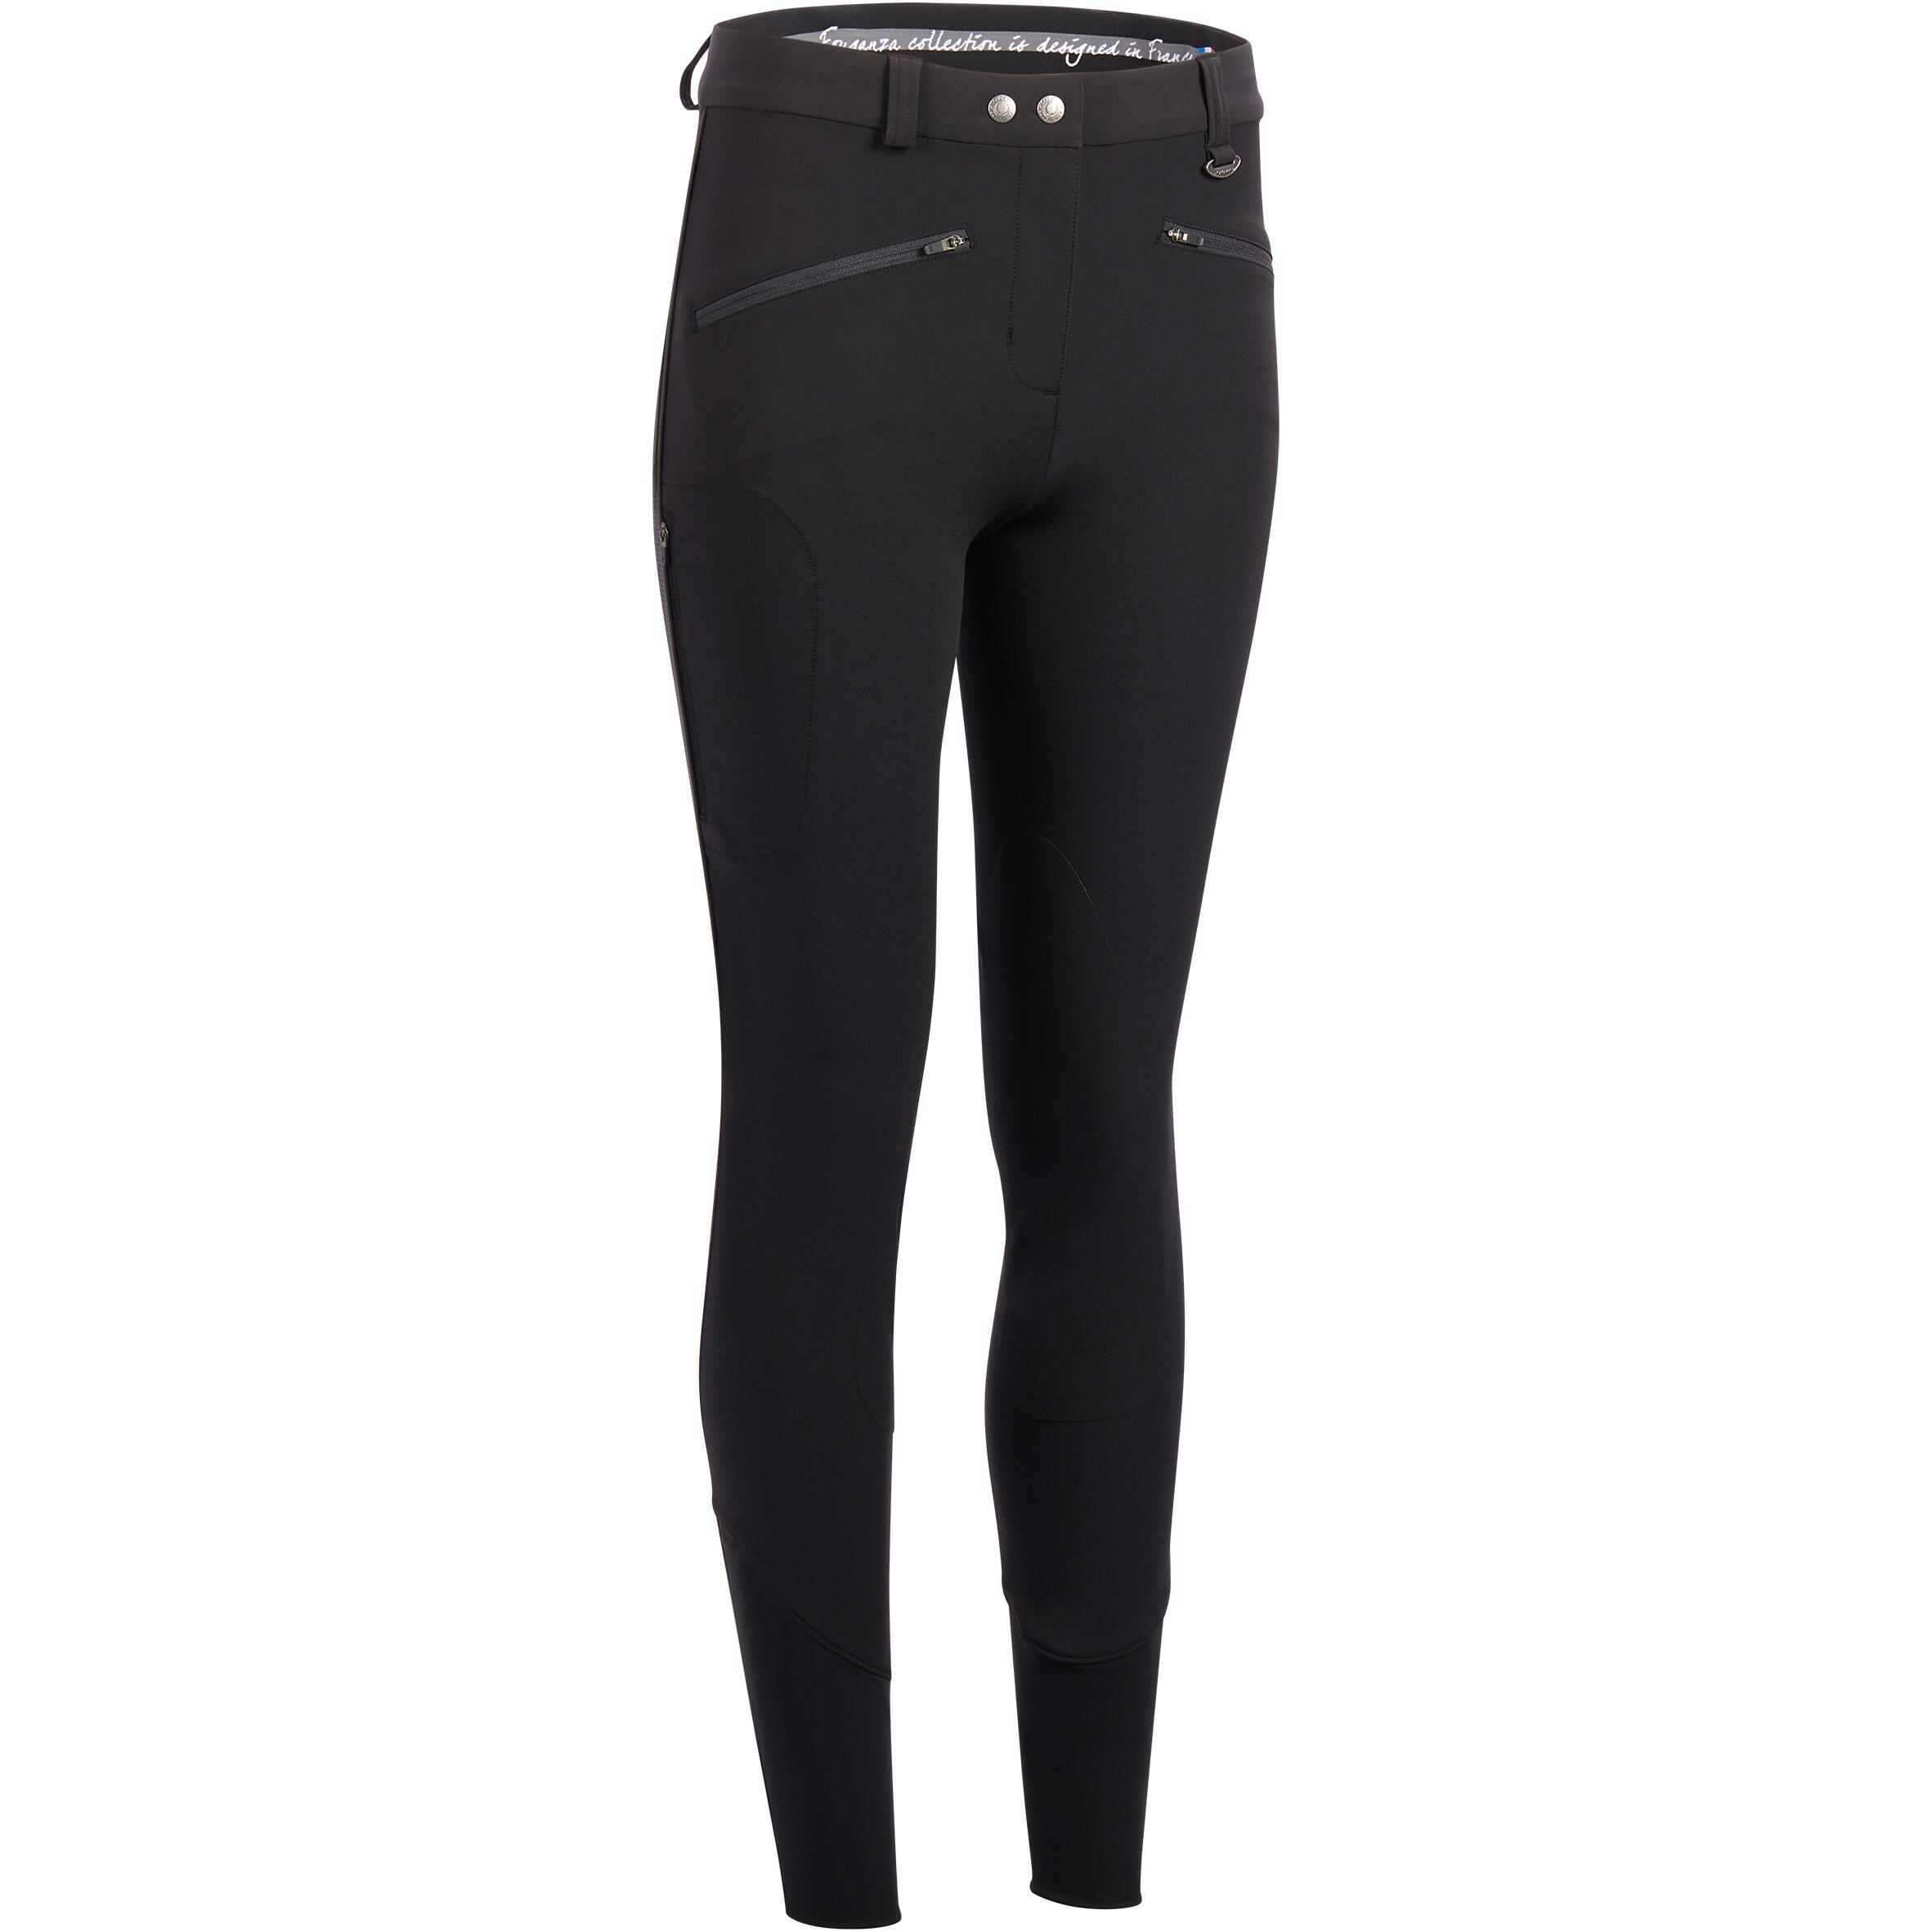 Pantalon 500 Mesh Negru damă